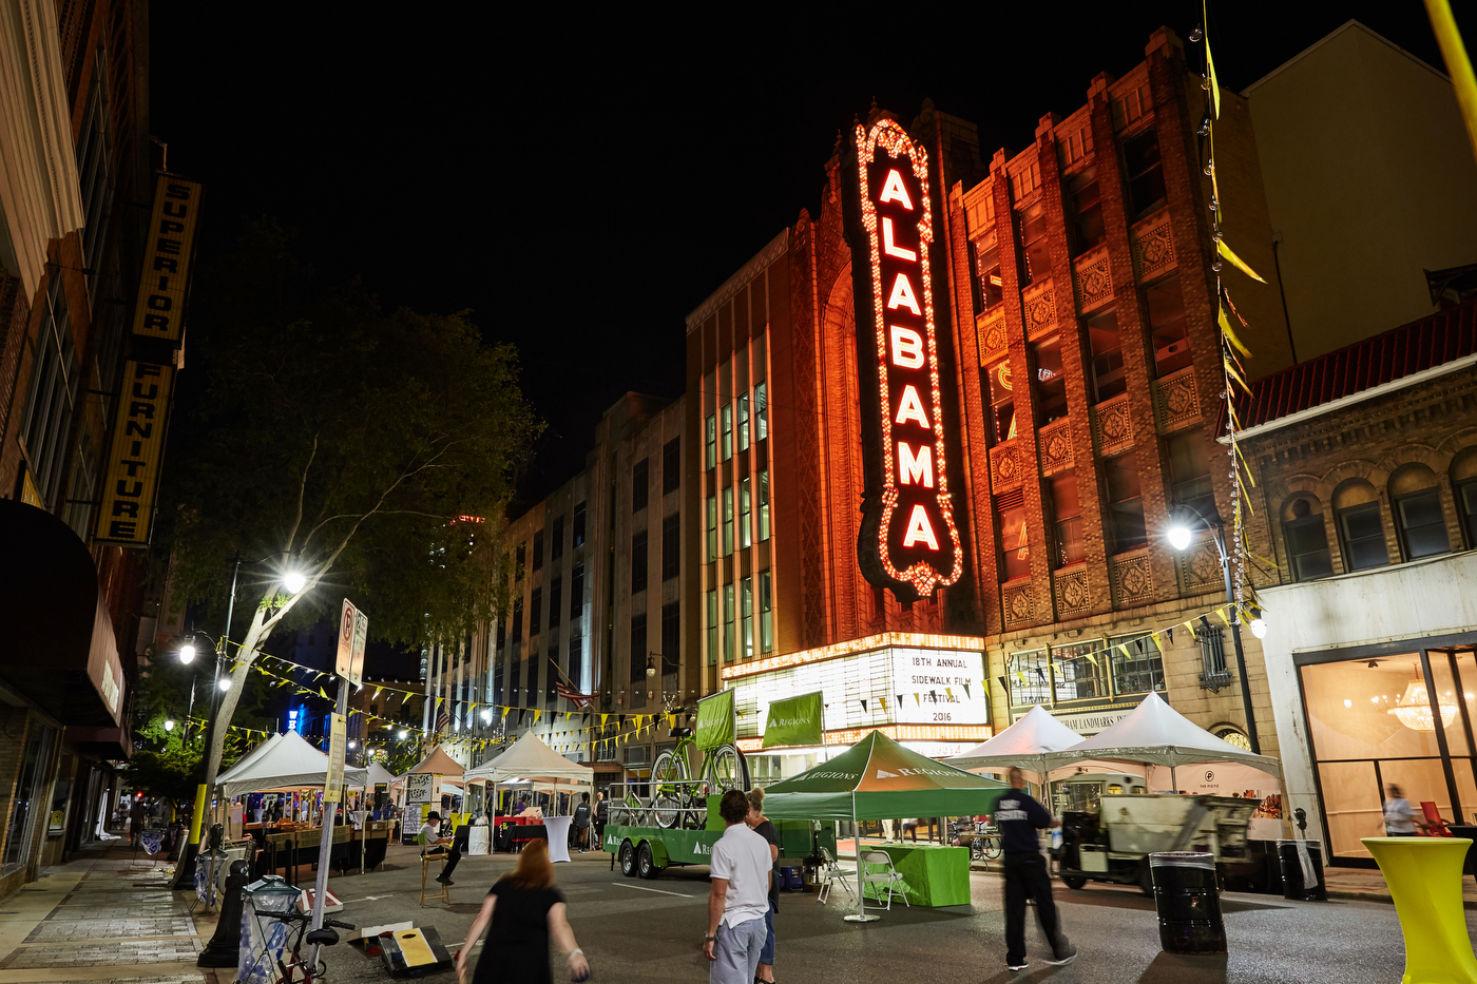 Albama Theater. Architecture. Birmingham, AL